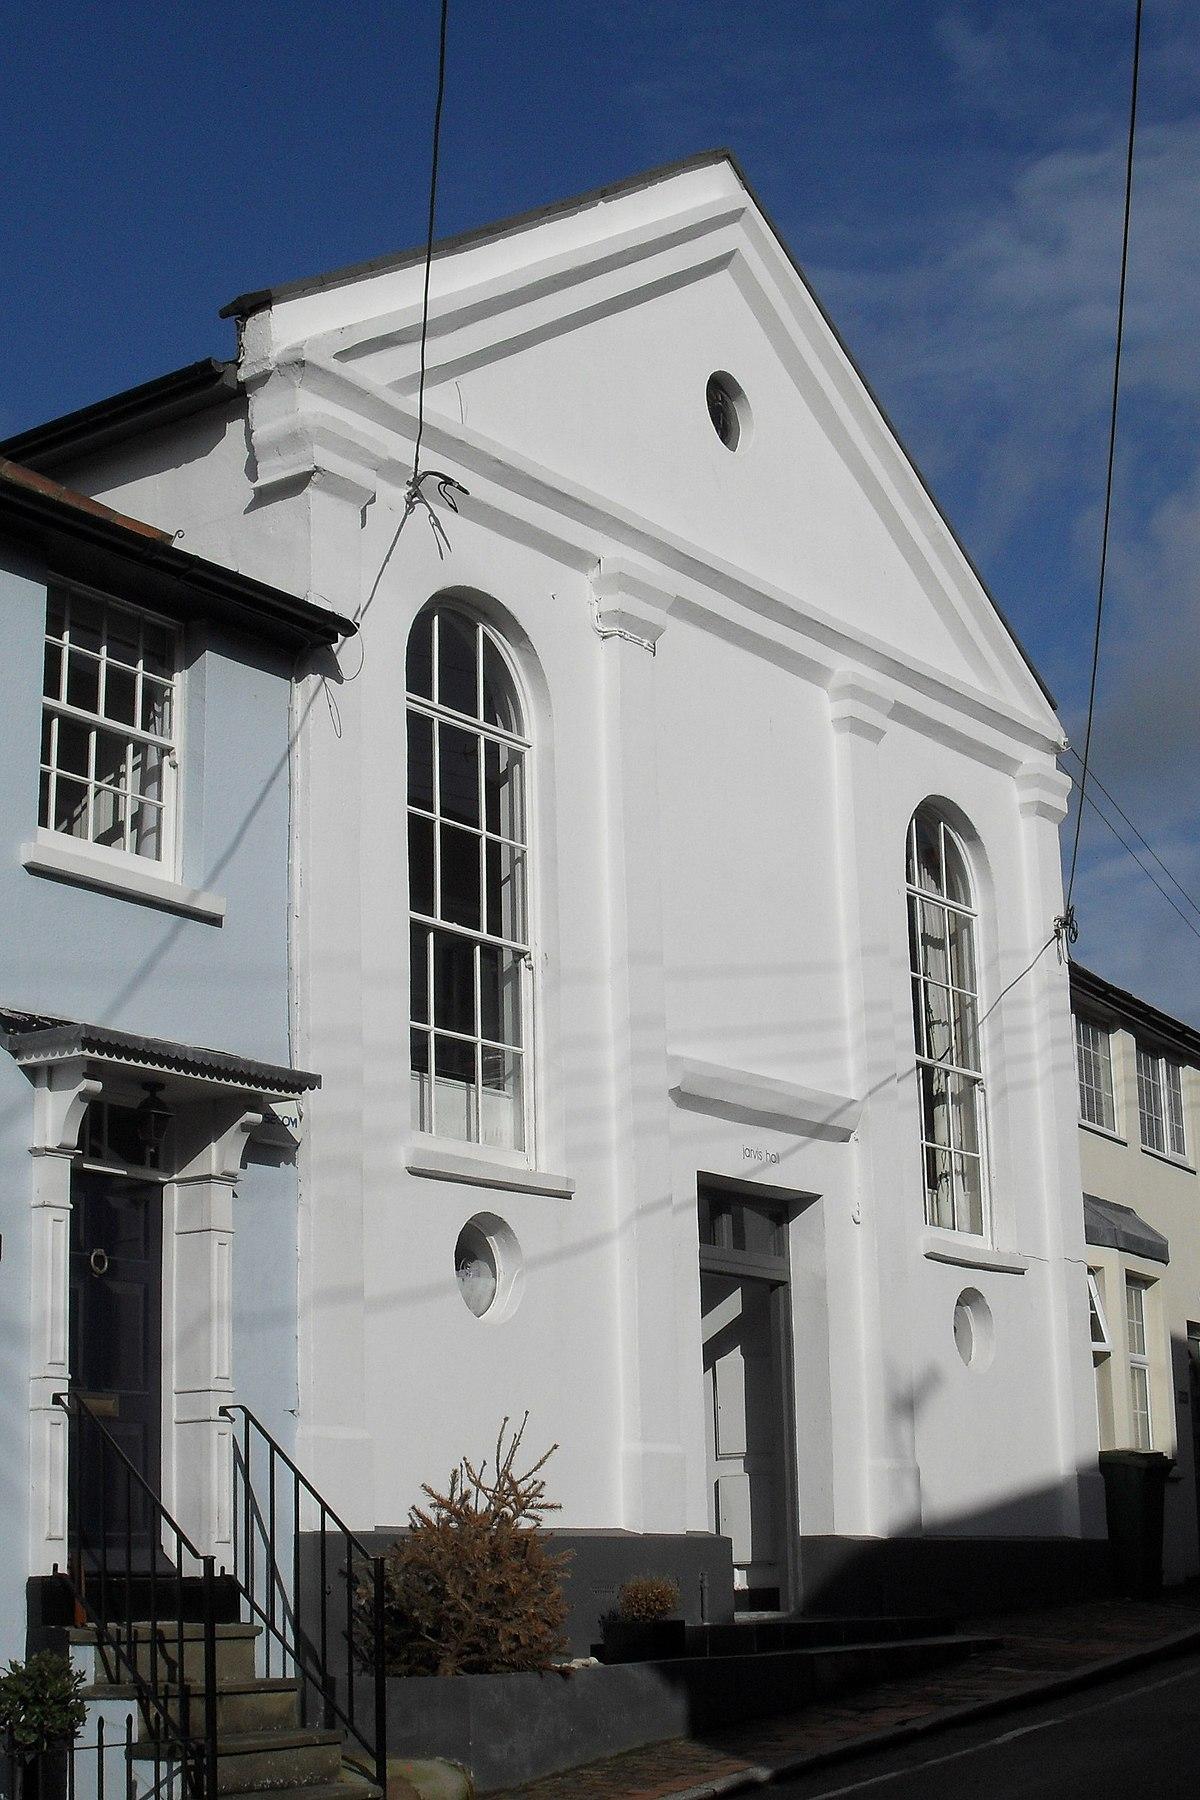 Jarvis Hall, Steyning - Wikipedia